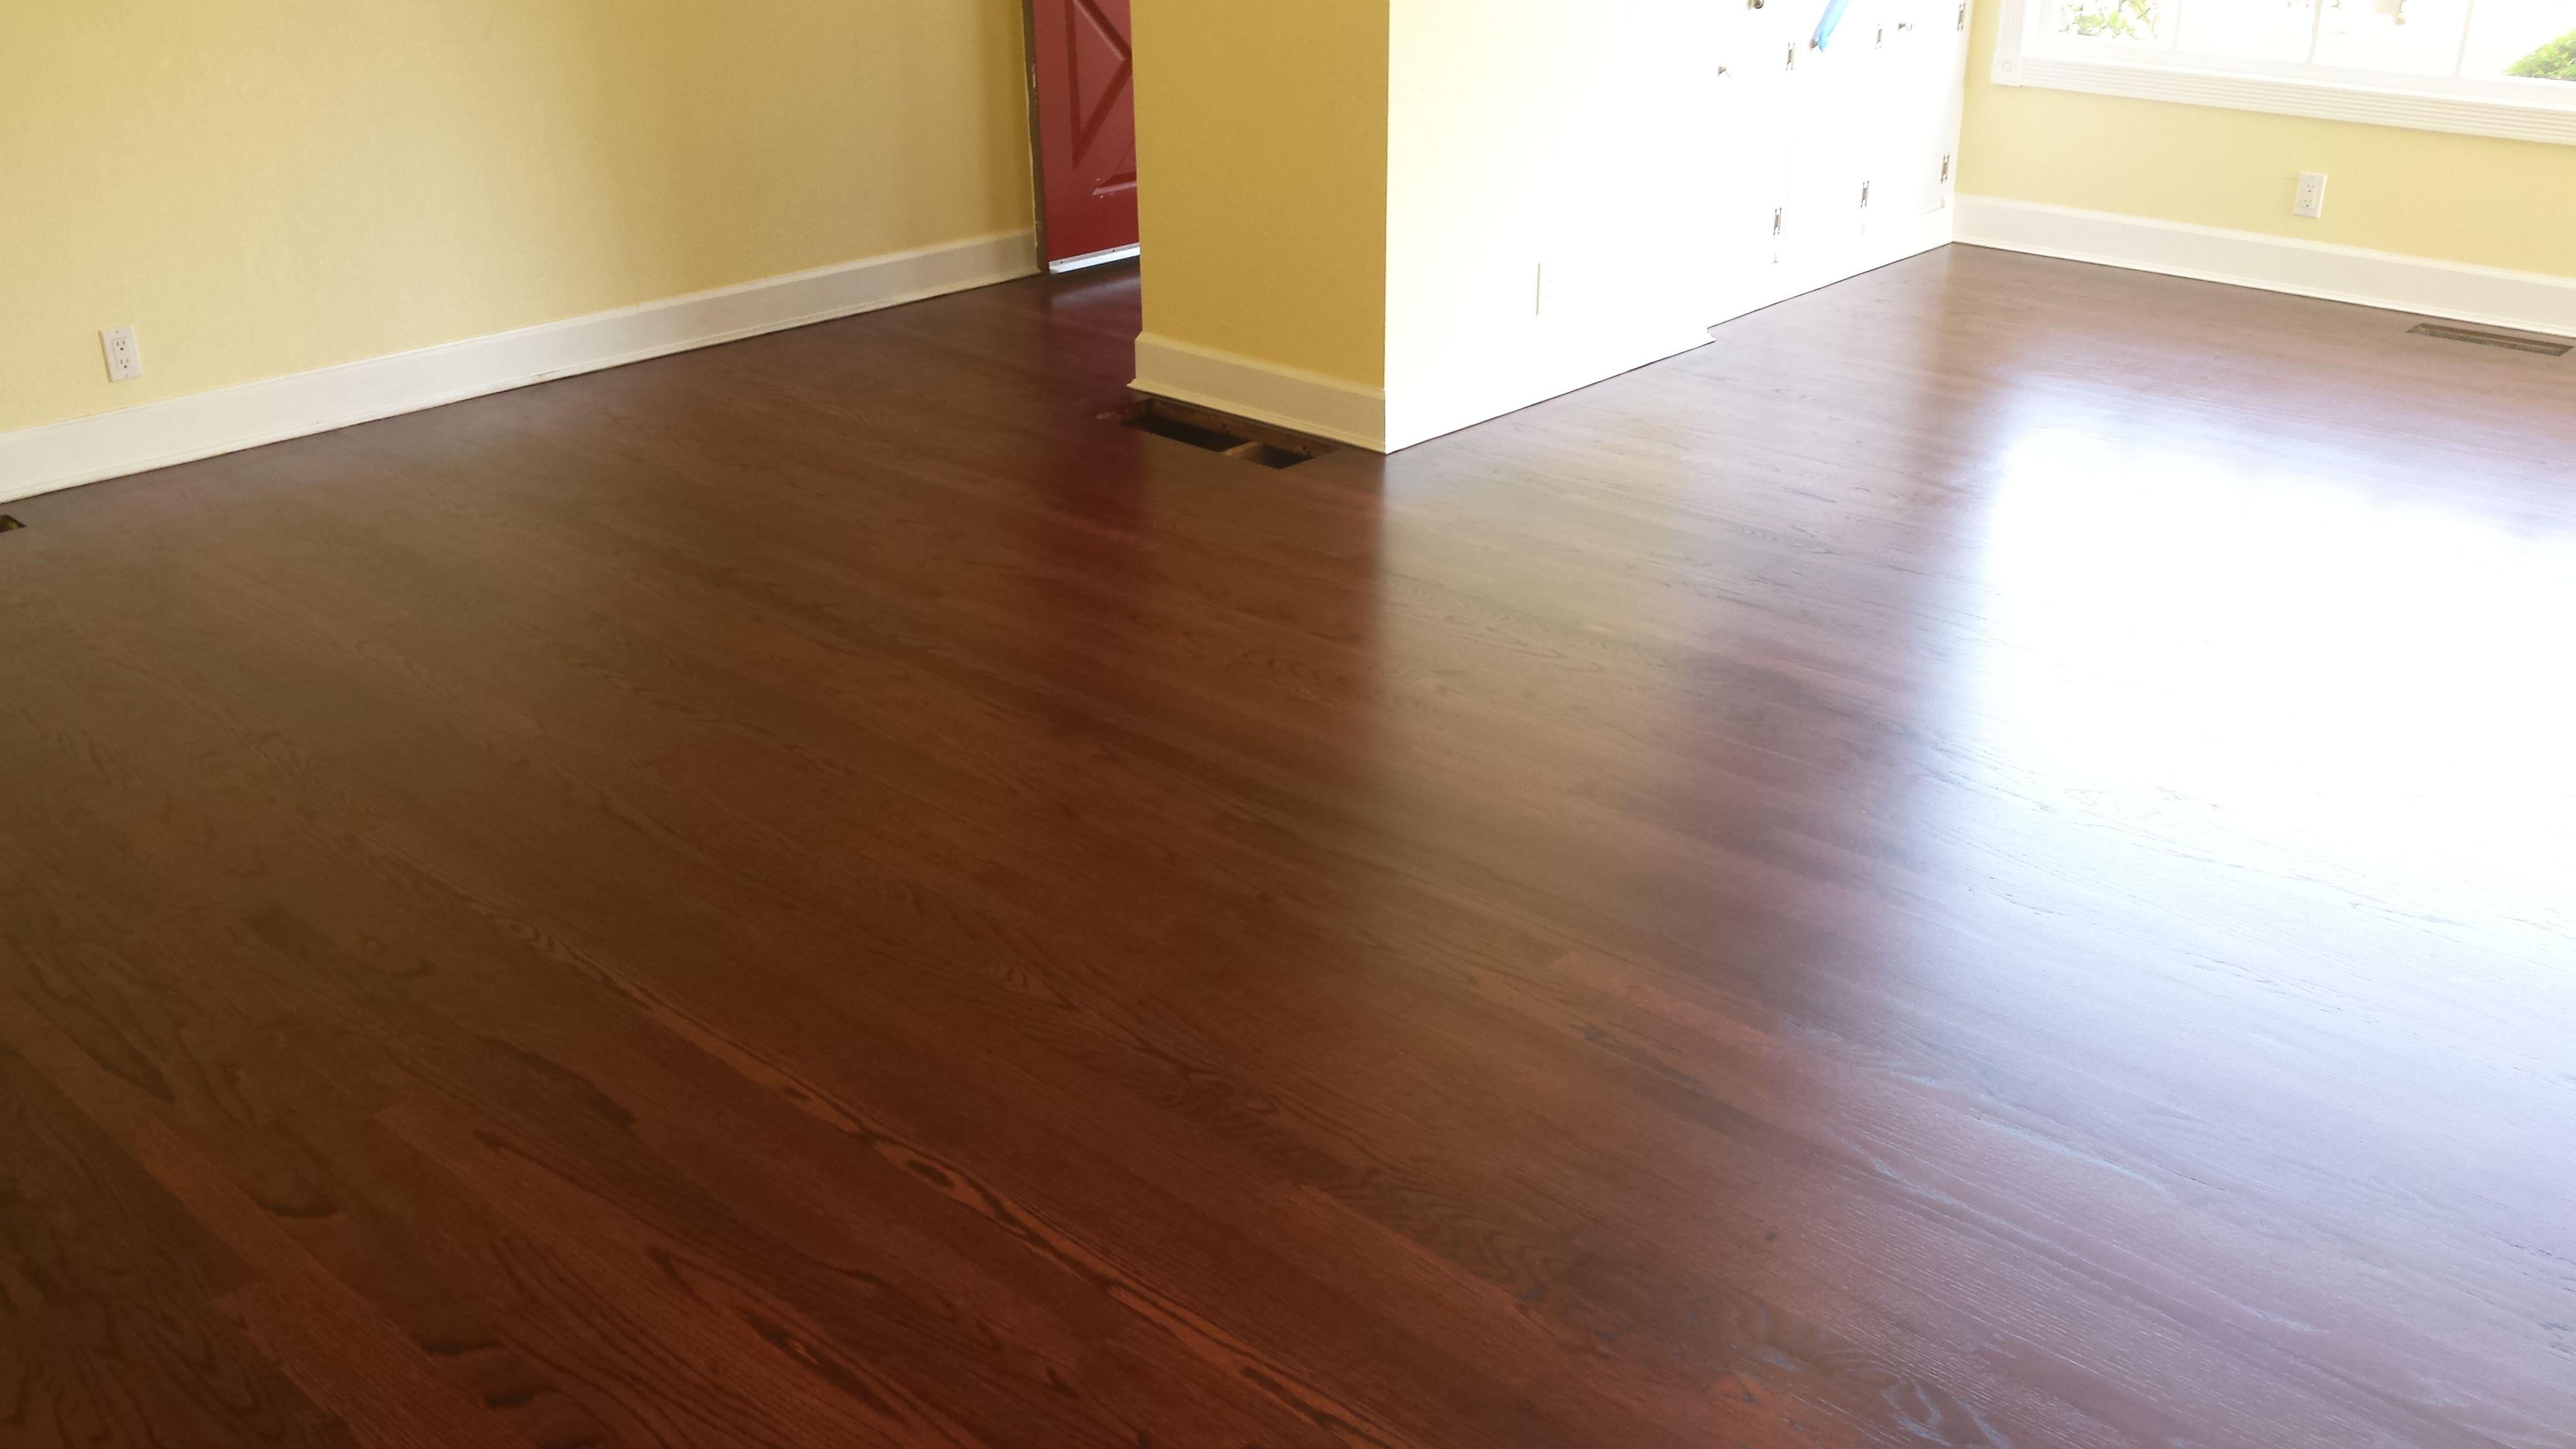 Duraseal Royal Mahogany Red Oak Modern Tech Wood Floors Portland Oregon Red Oak Wood Floors Hardwood Floors Wood Floors